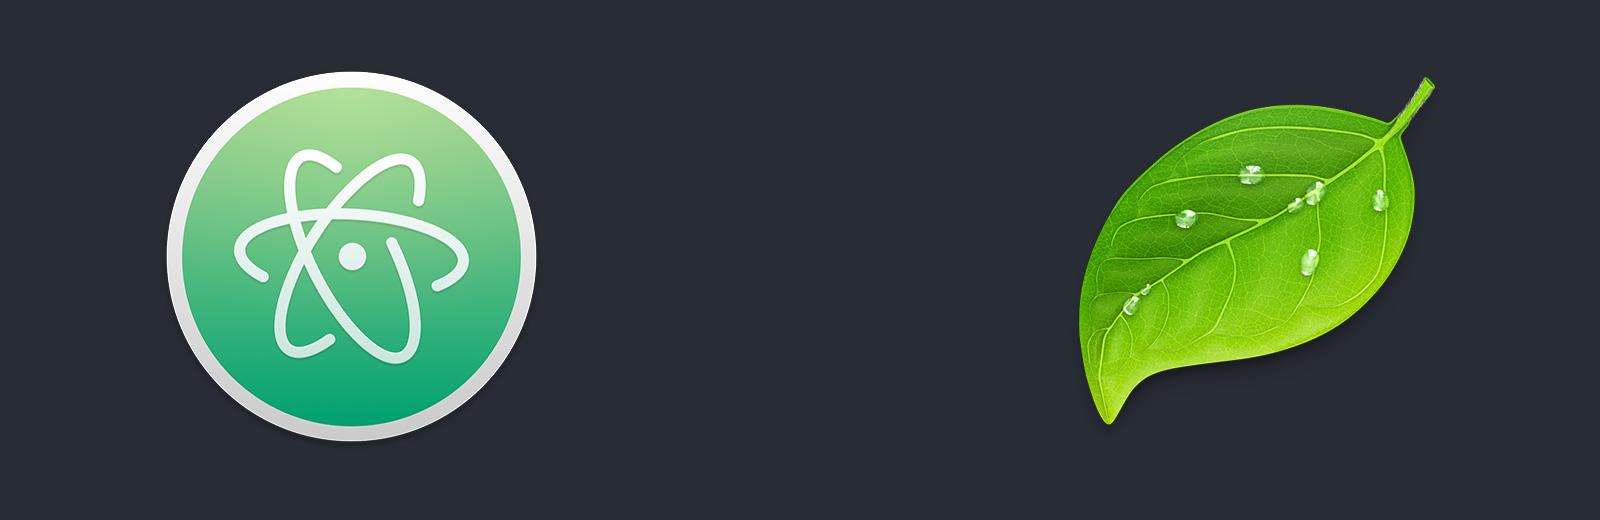 Atom versus Coda text editor